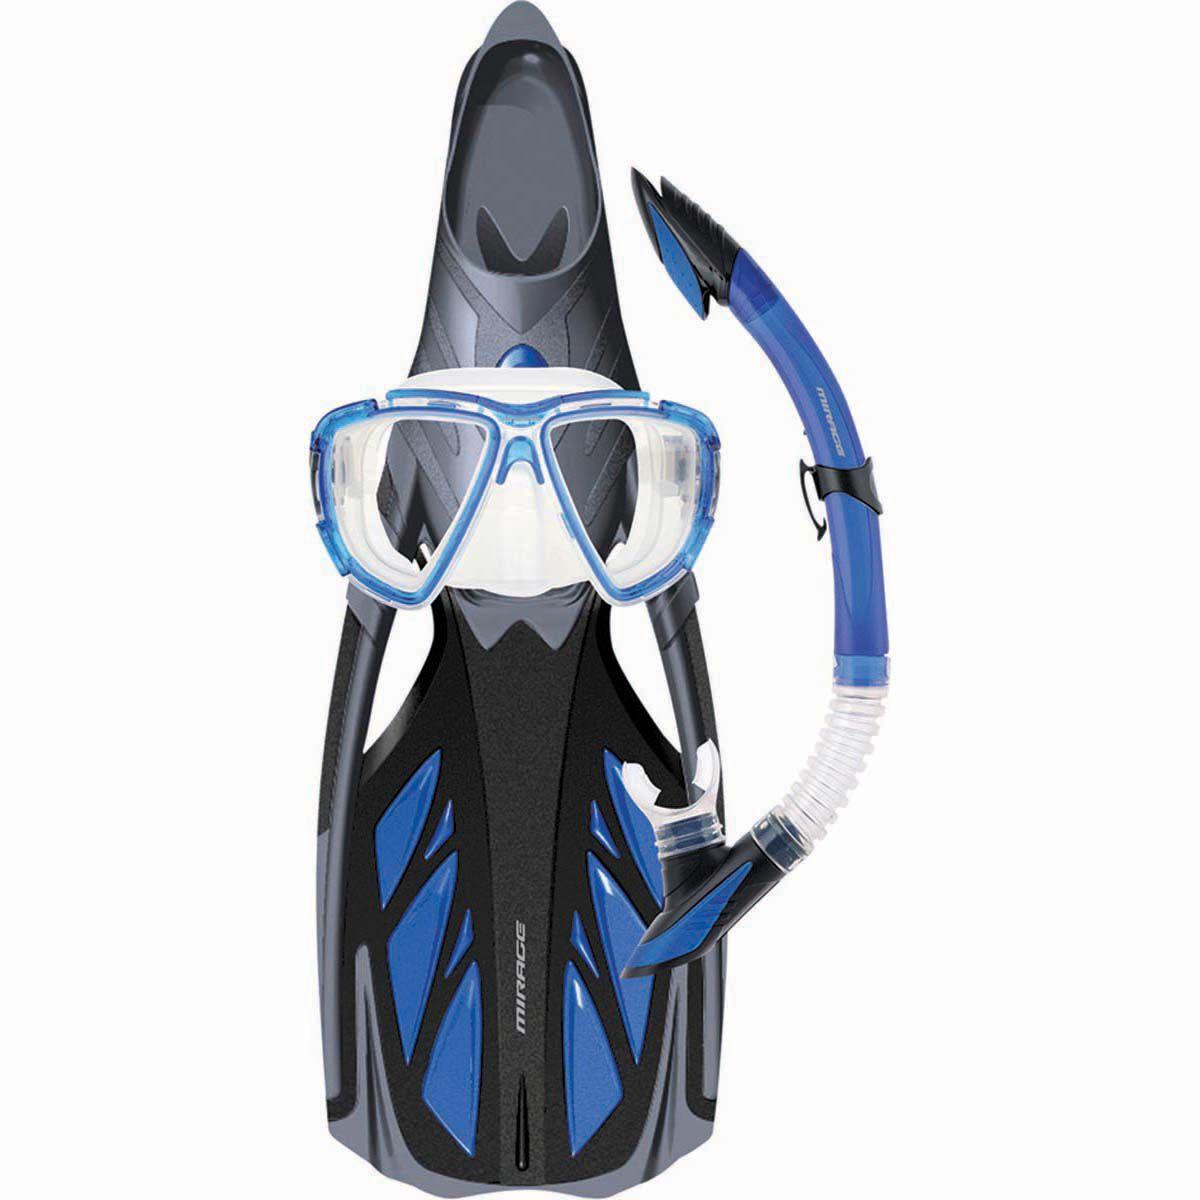 L//XL Flippers ONLY Sizes Mirage Crystal KIDS Snorkel Swim Pool Fins S//M